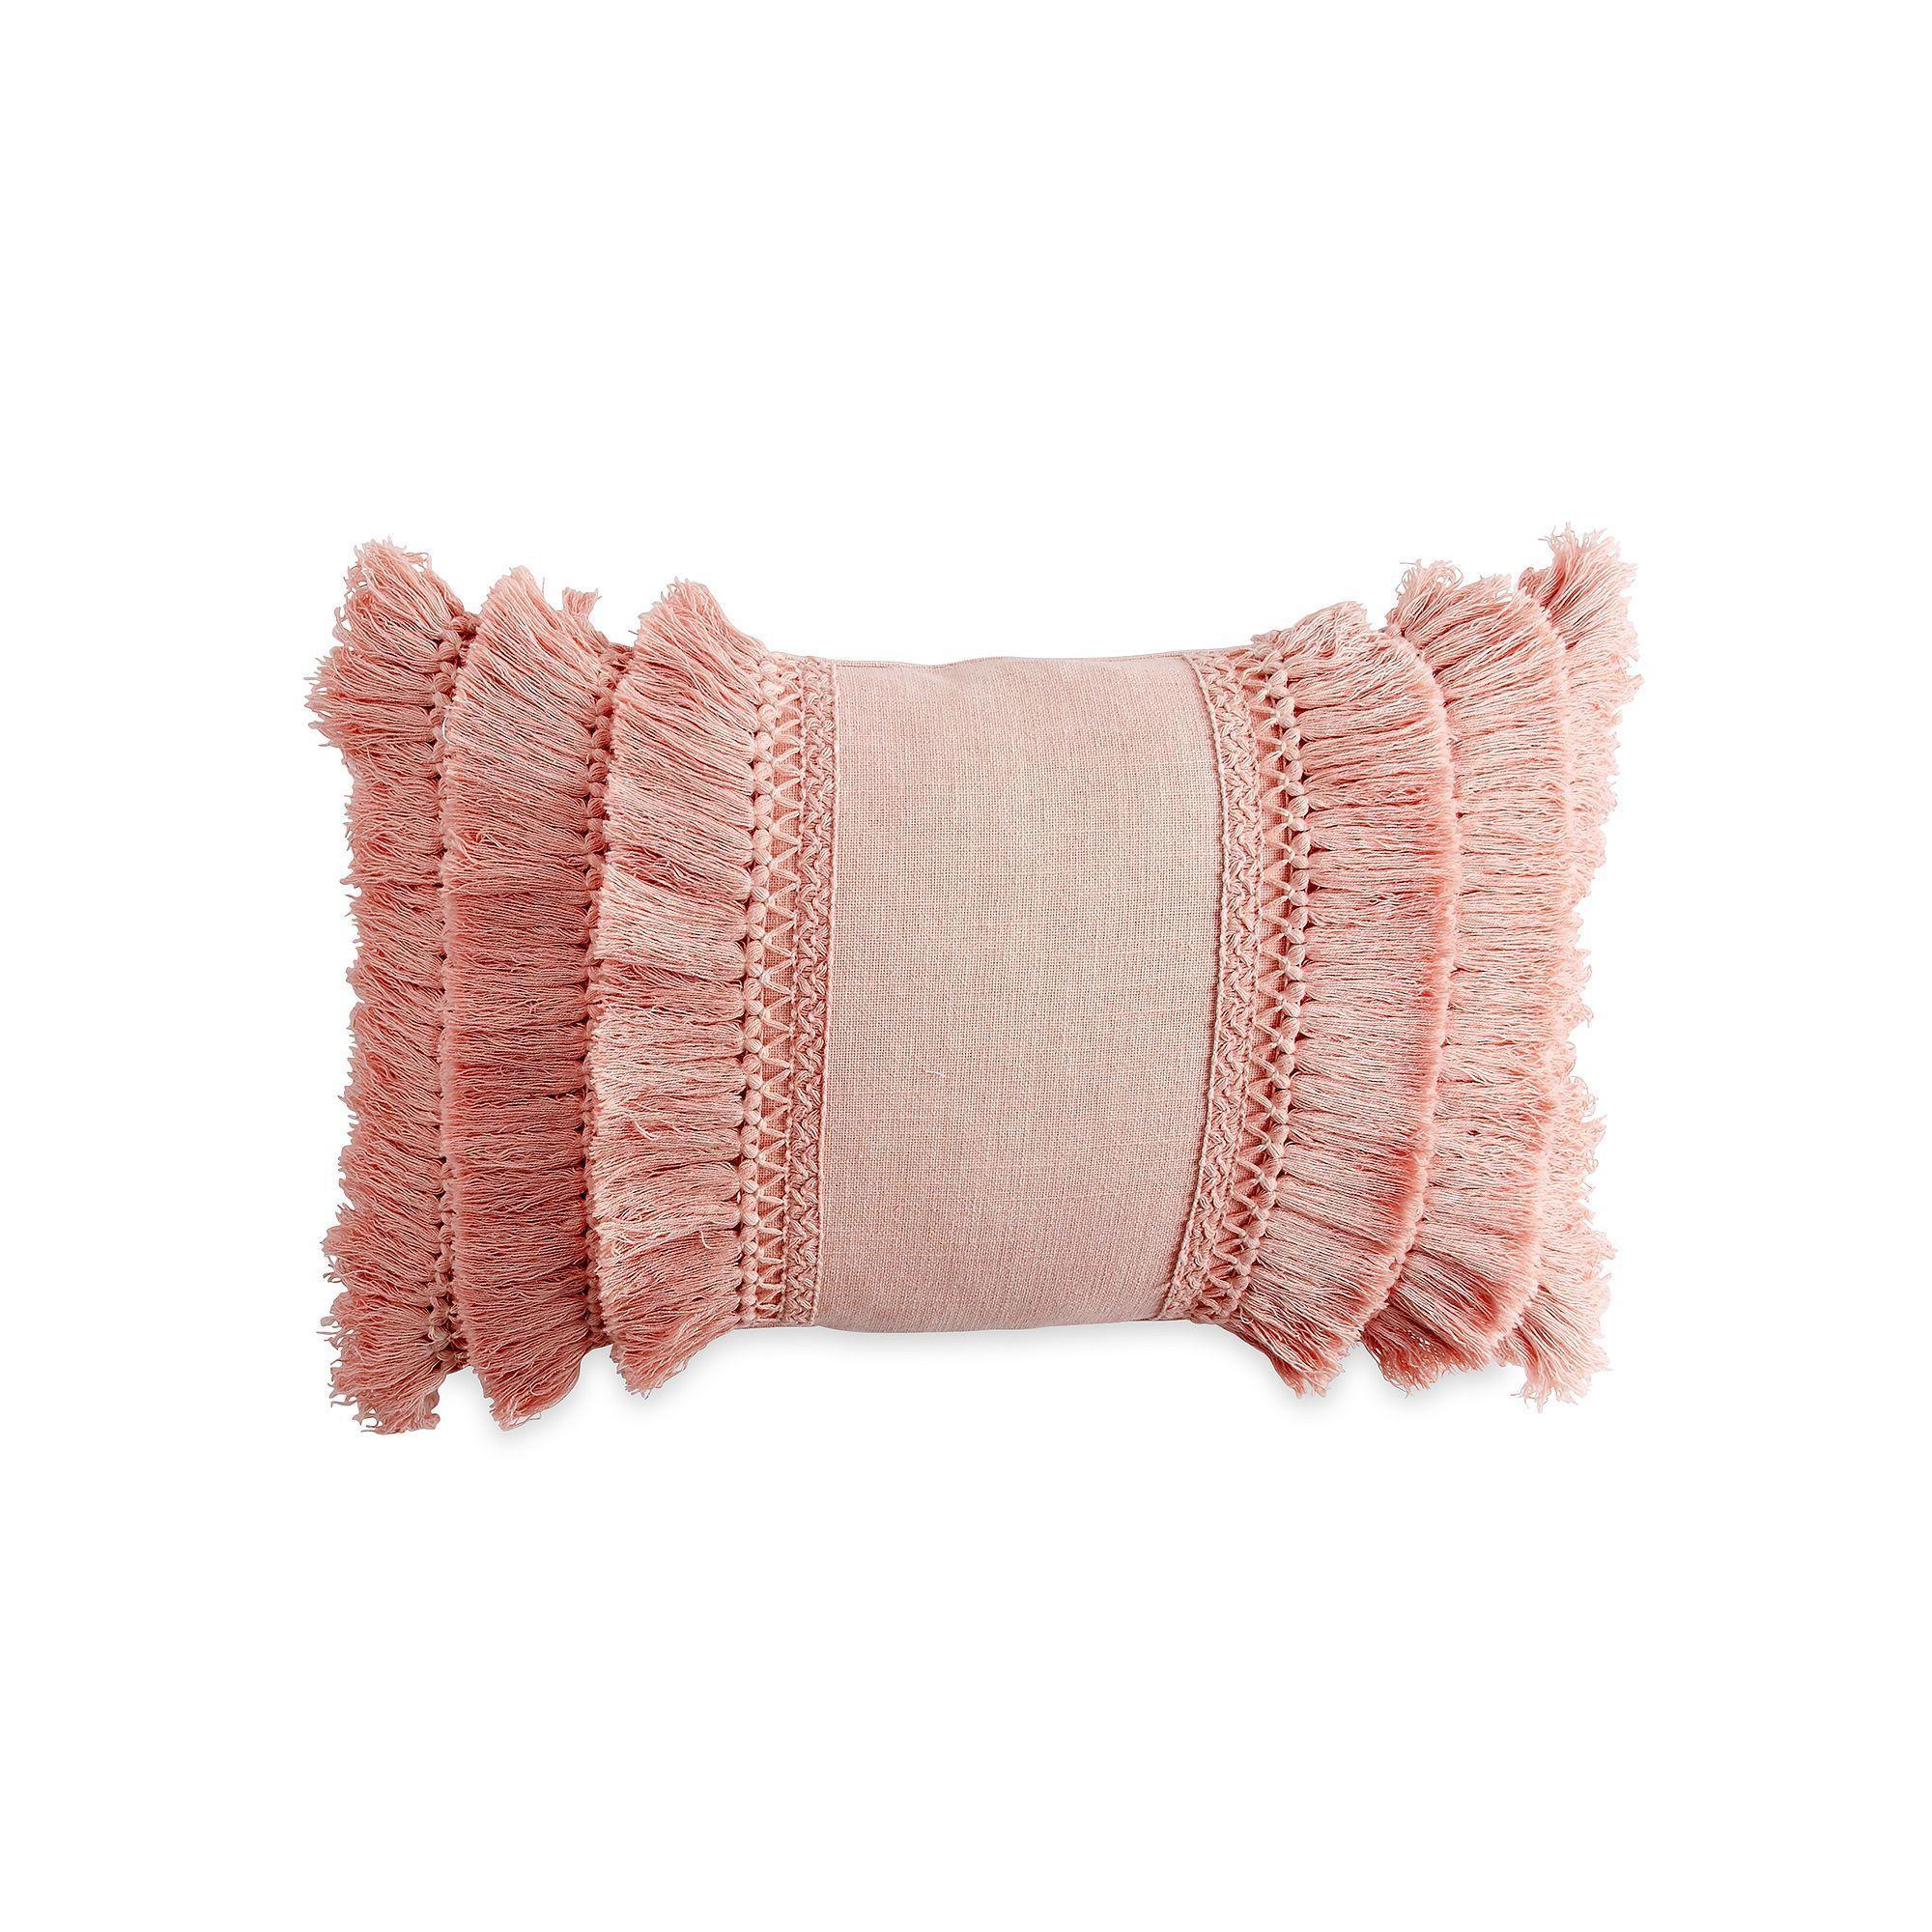 Coussin Pour Chambre D Ado peri fringe throw pillow, pink, 12x18 rect | chambre ado